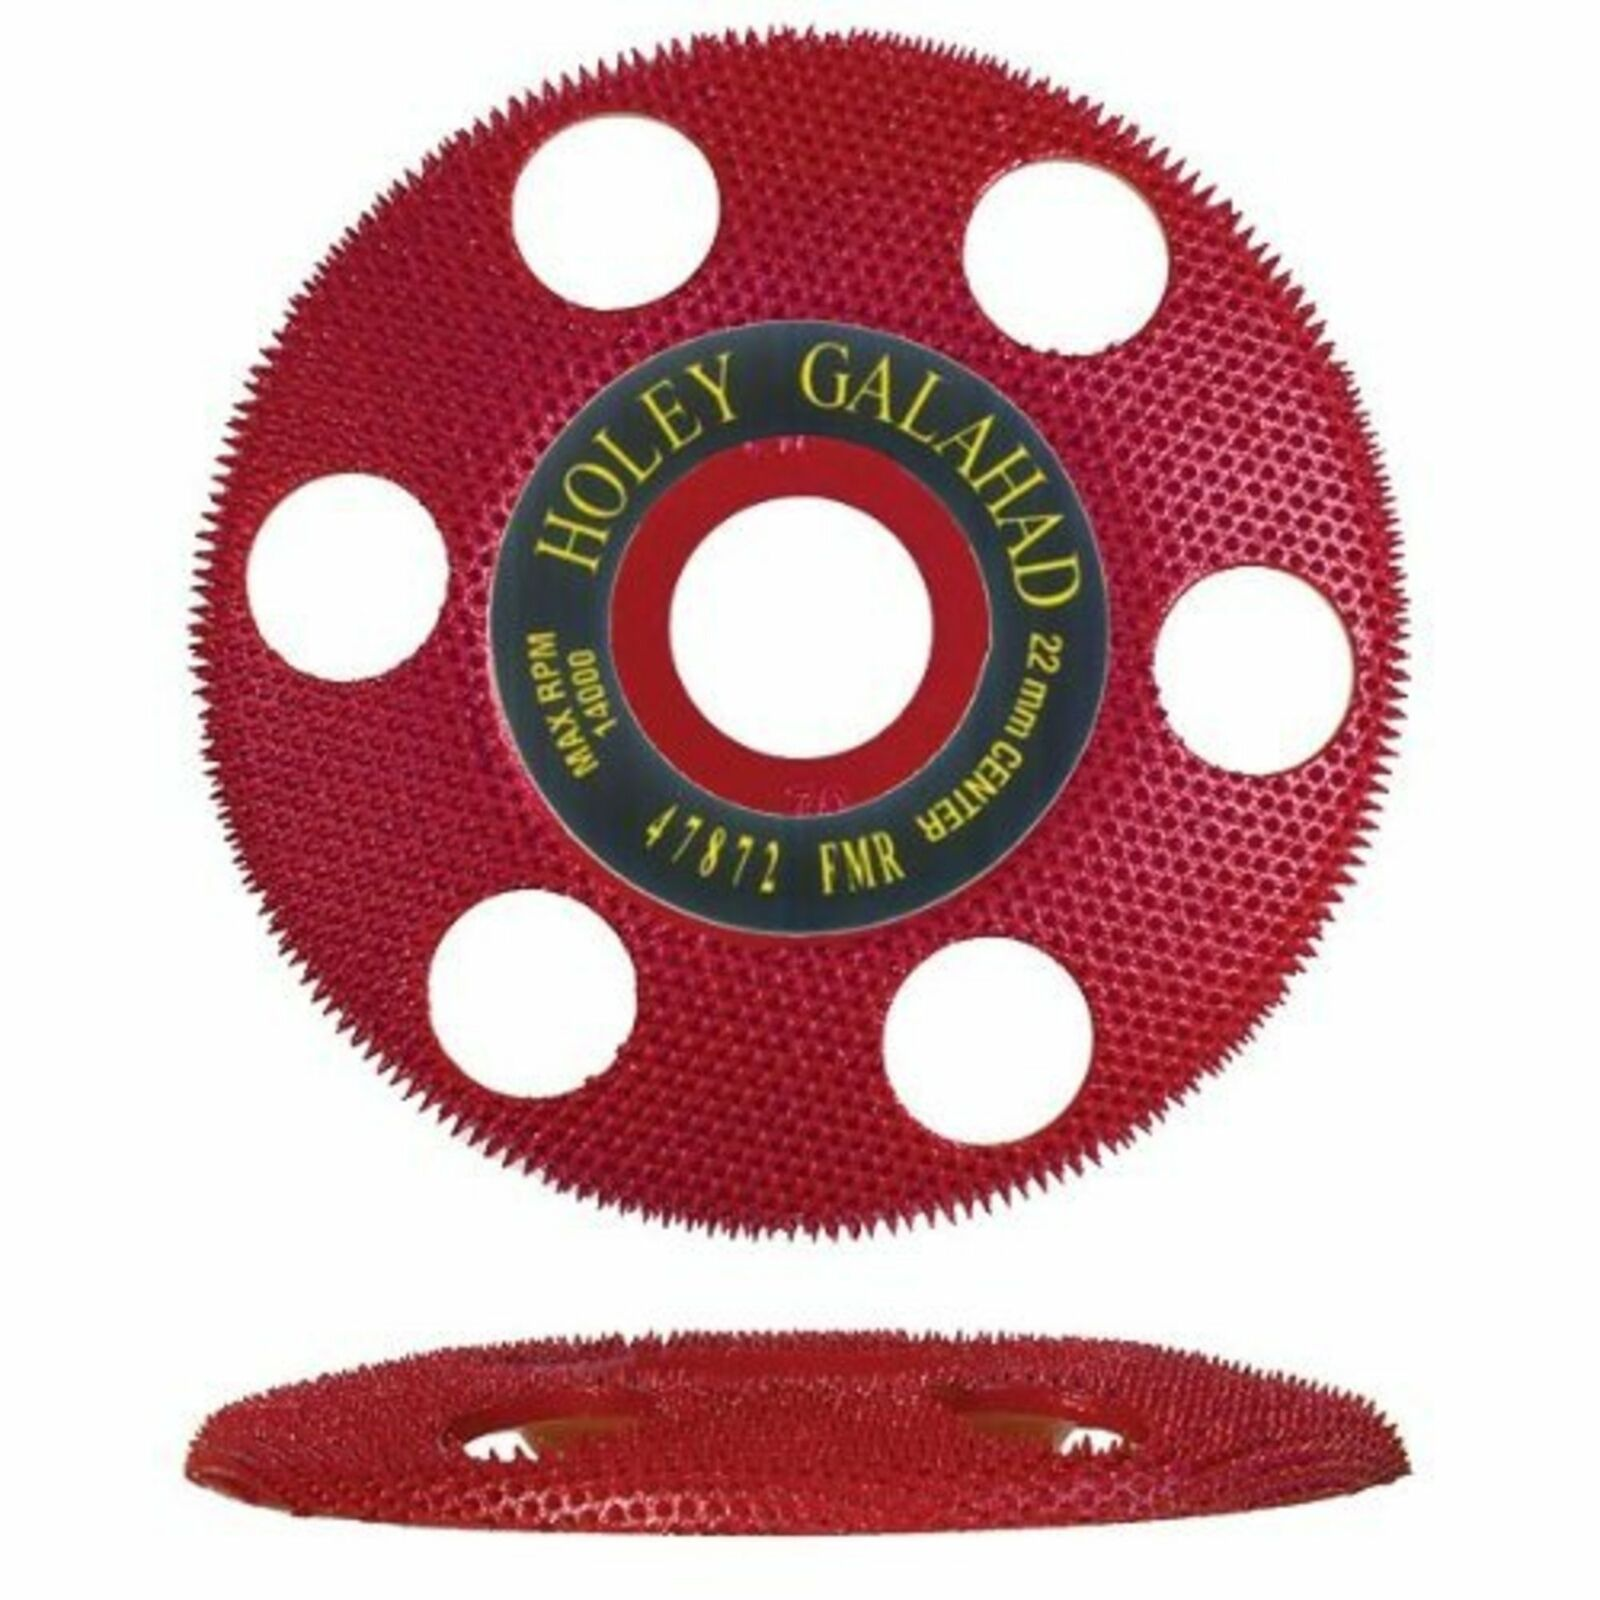 King Arthur S Tools Holey Galahad Flat Medium Red 70 Grit Disc For Sale Online Ebay